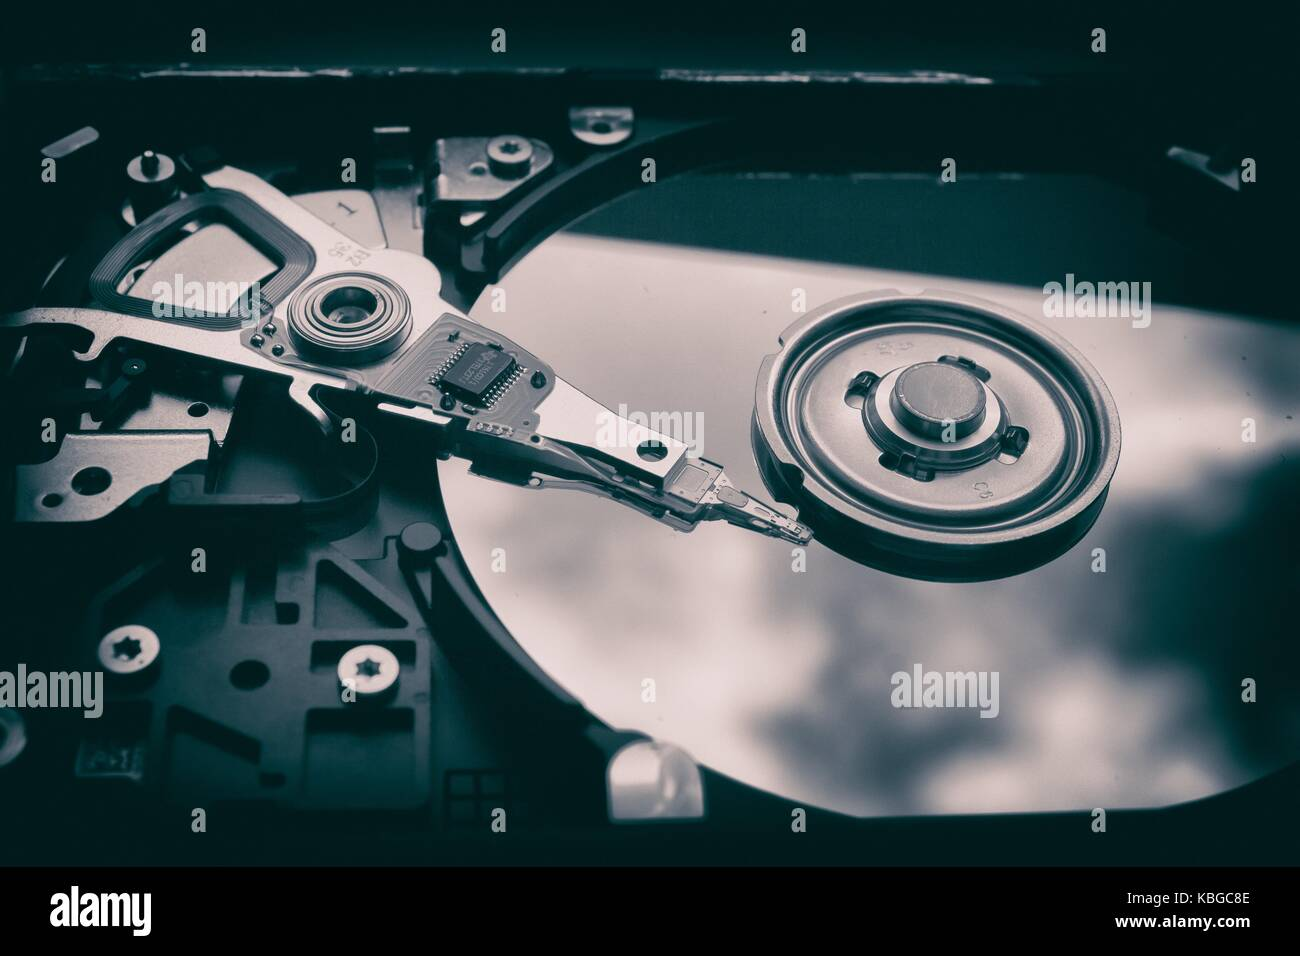 Computer Hard Drive on Display - Stock Image